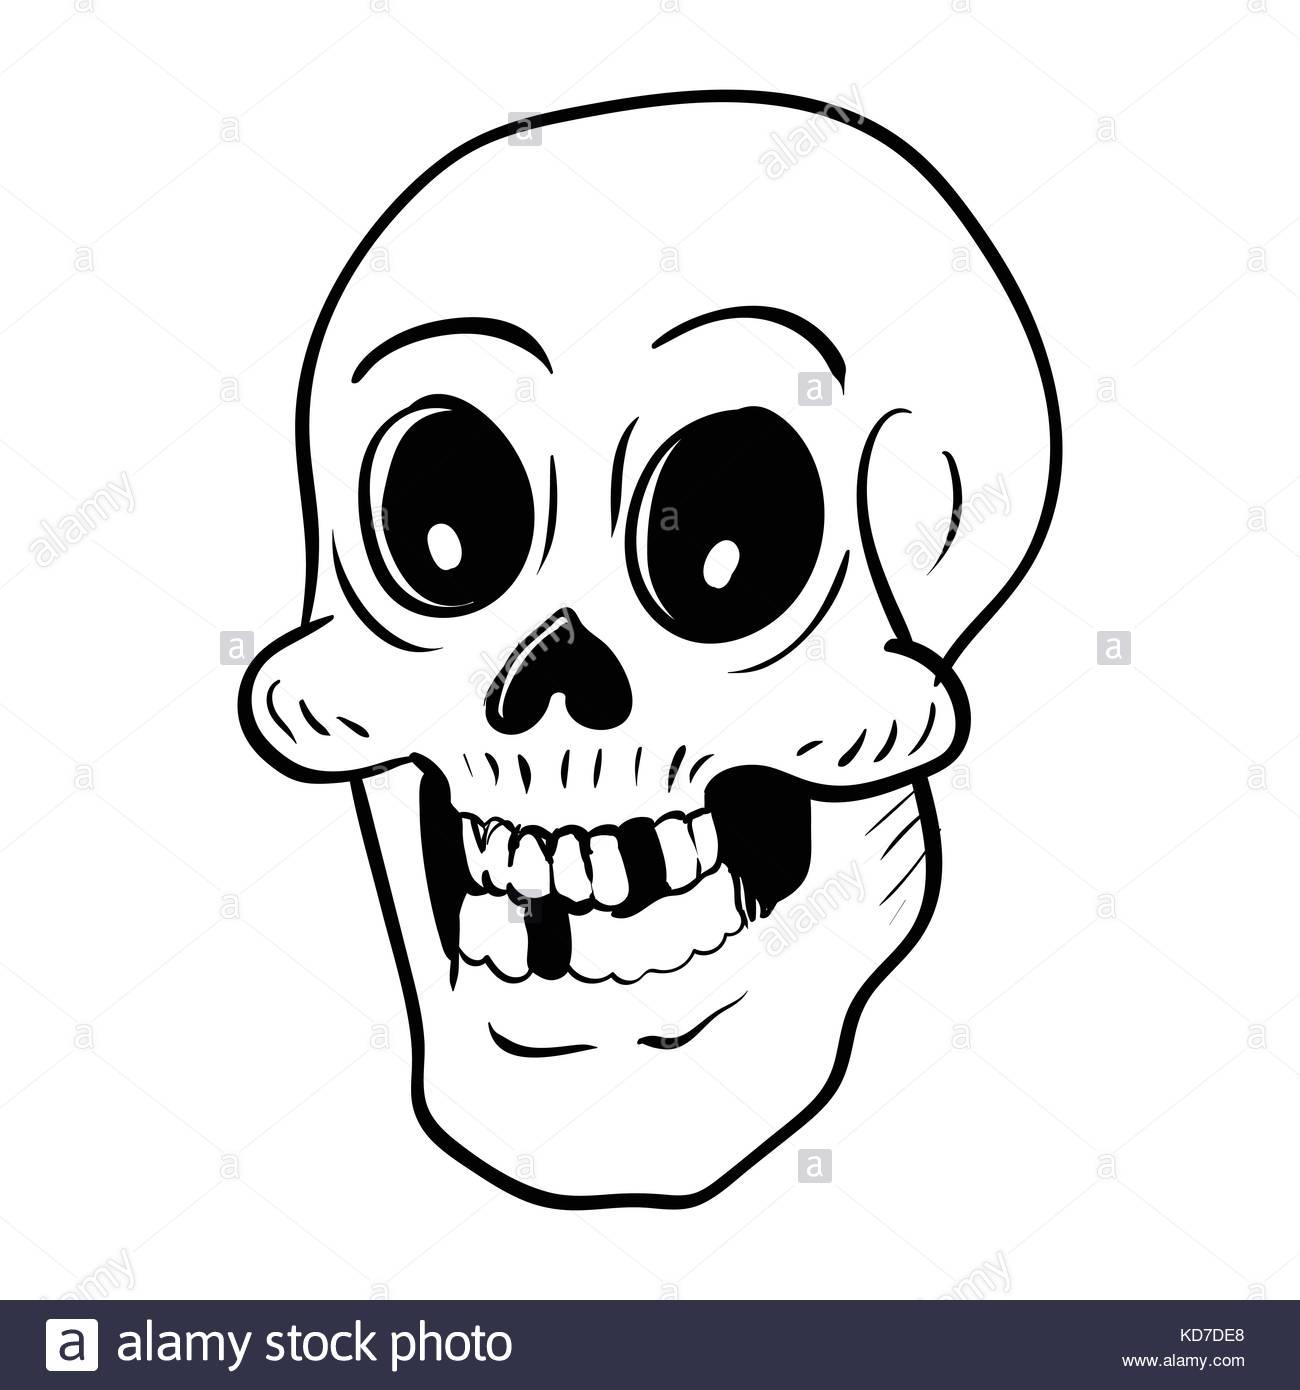 1300x1390 Hand Drawing Skull Head Cartoon For Halloween Concept, Isolated